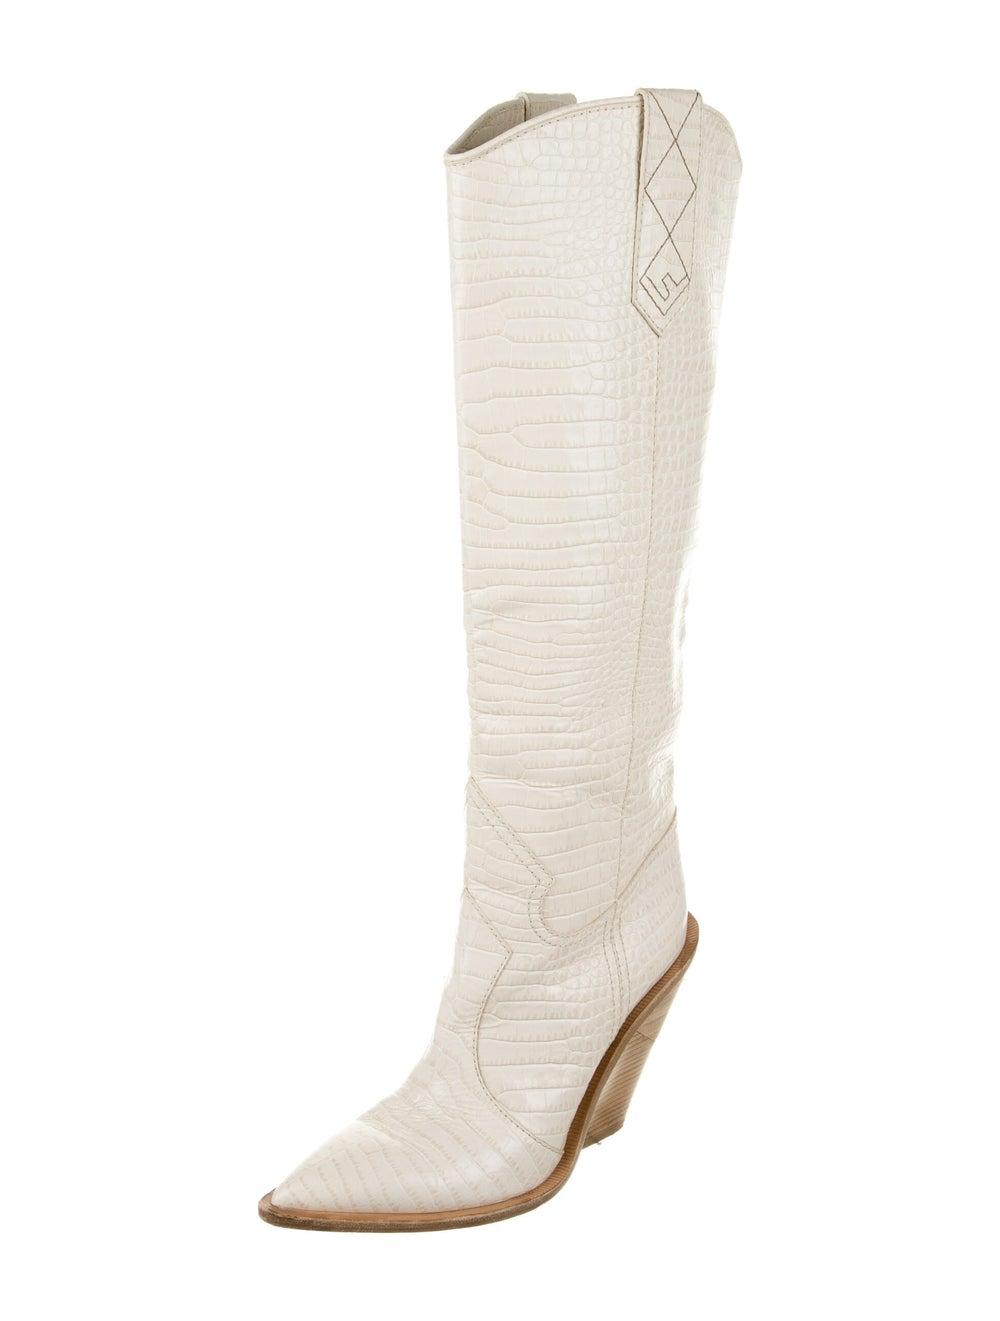 Fendi 2018 2018 Cutwalk Cowboy Embossed Boots Whi… - image 2